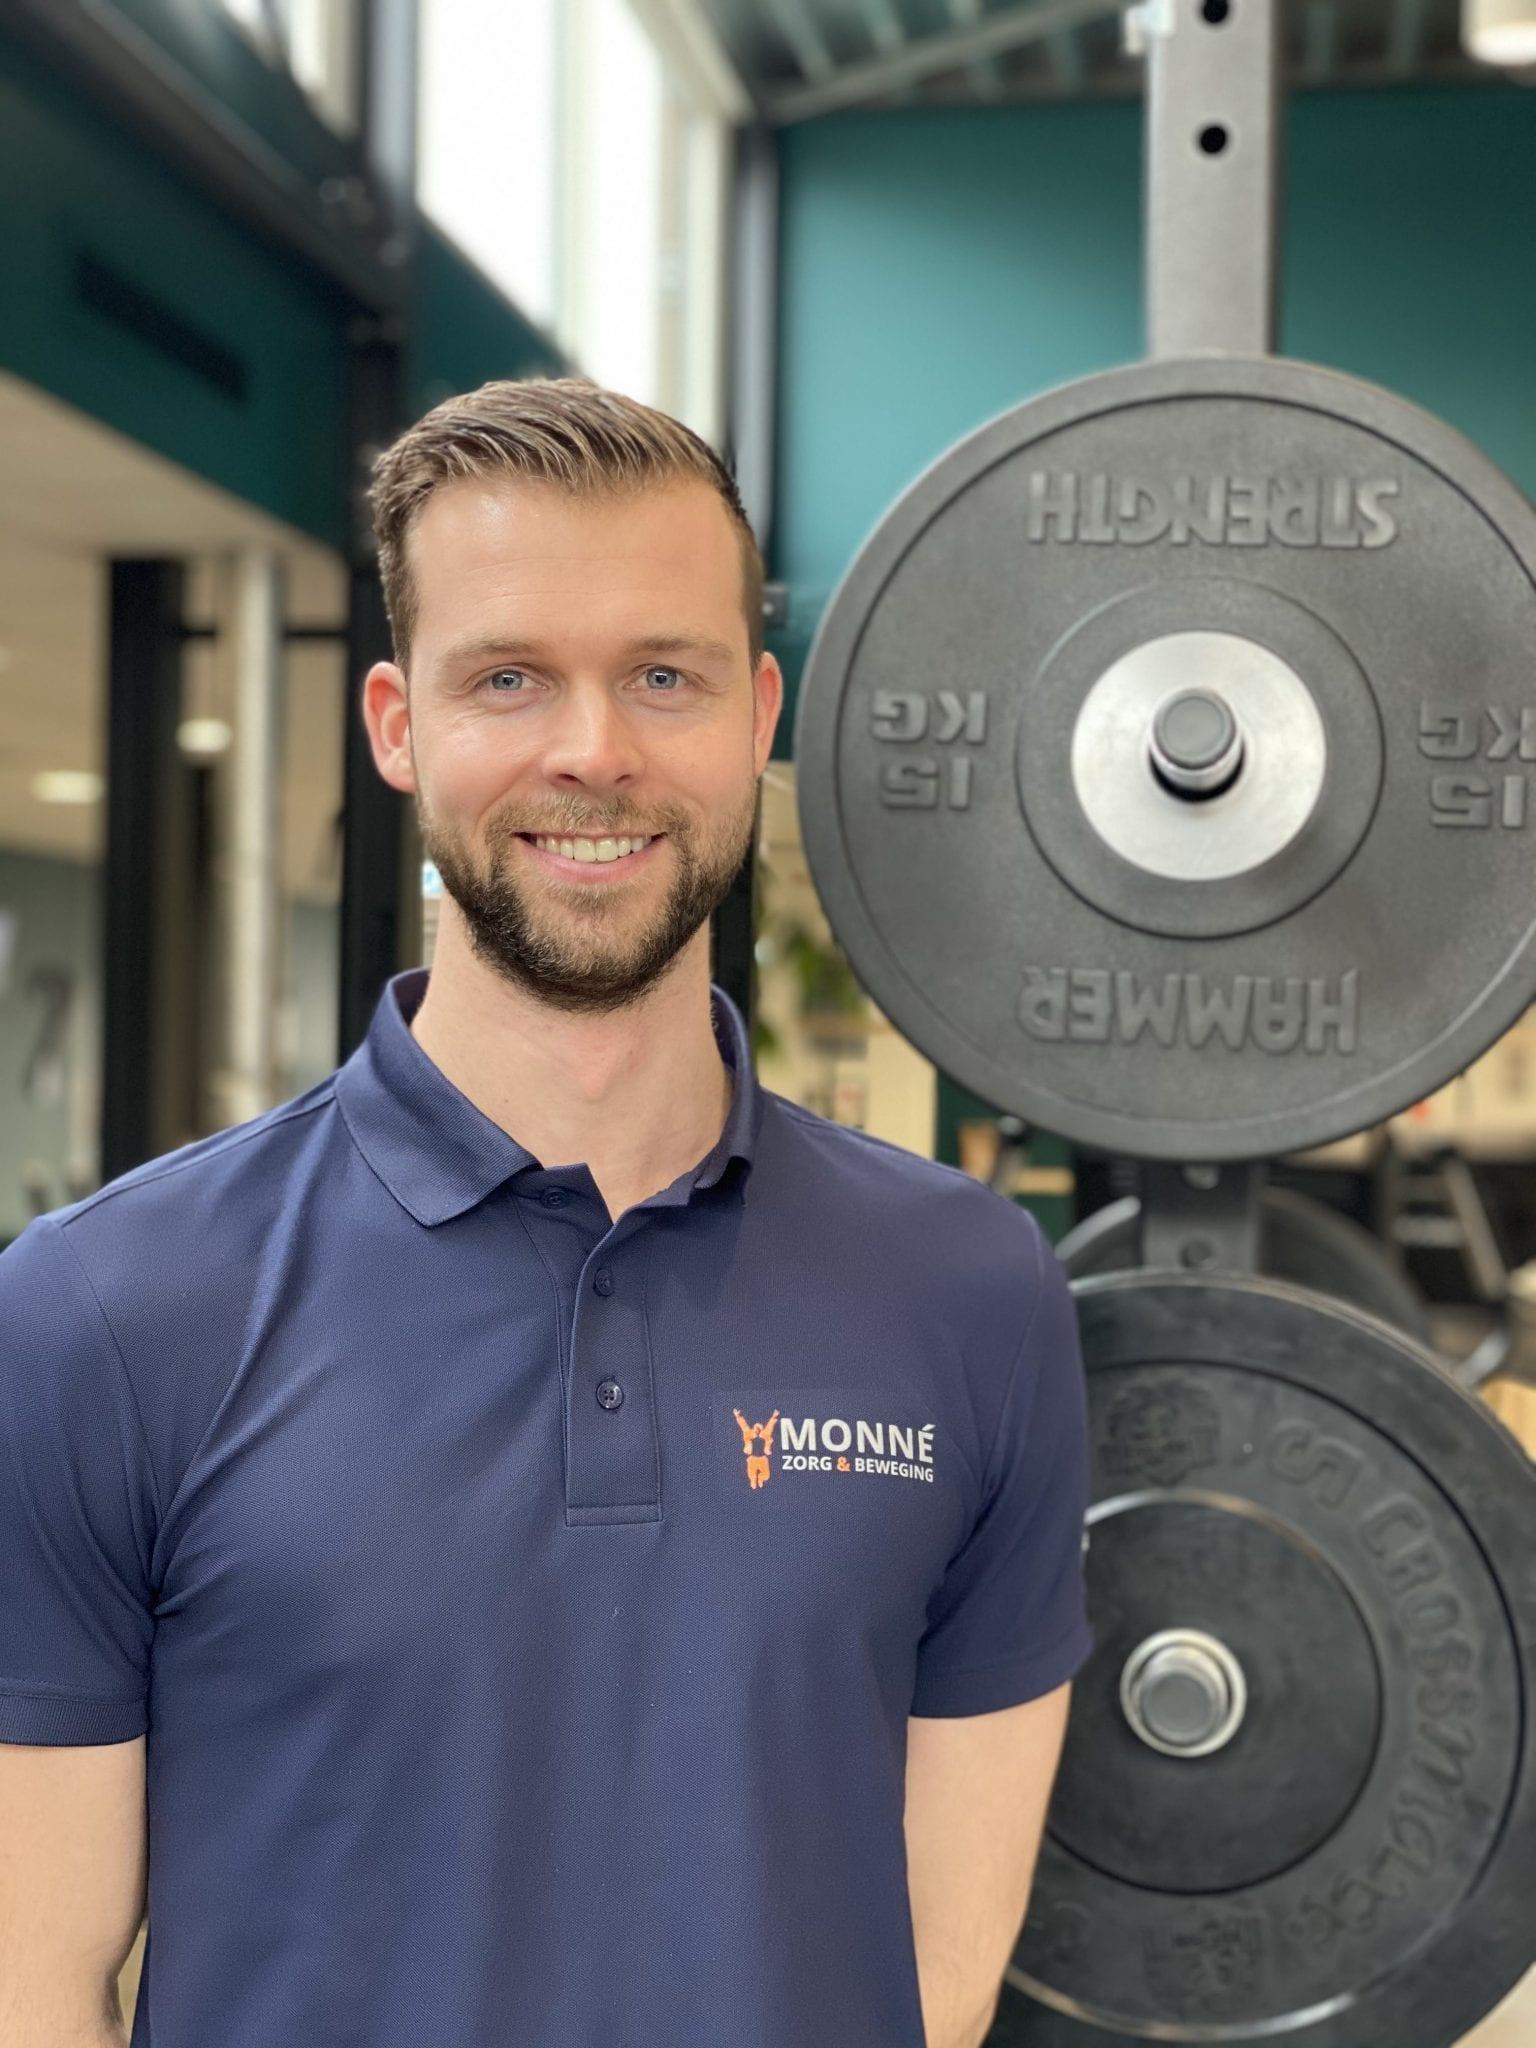 Joeri Polman, Fysiotherapie | Monné Zorg & Beweging Breda